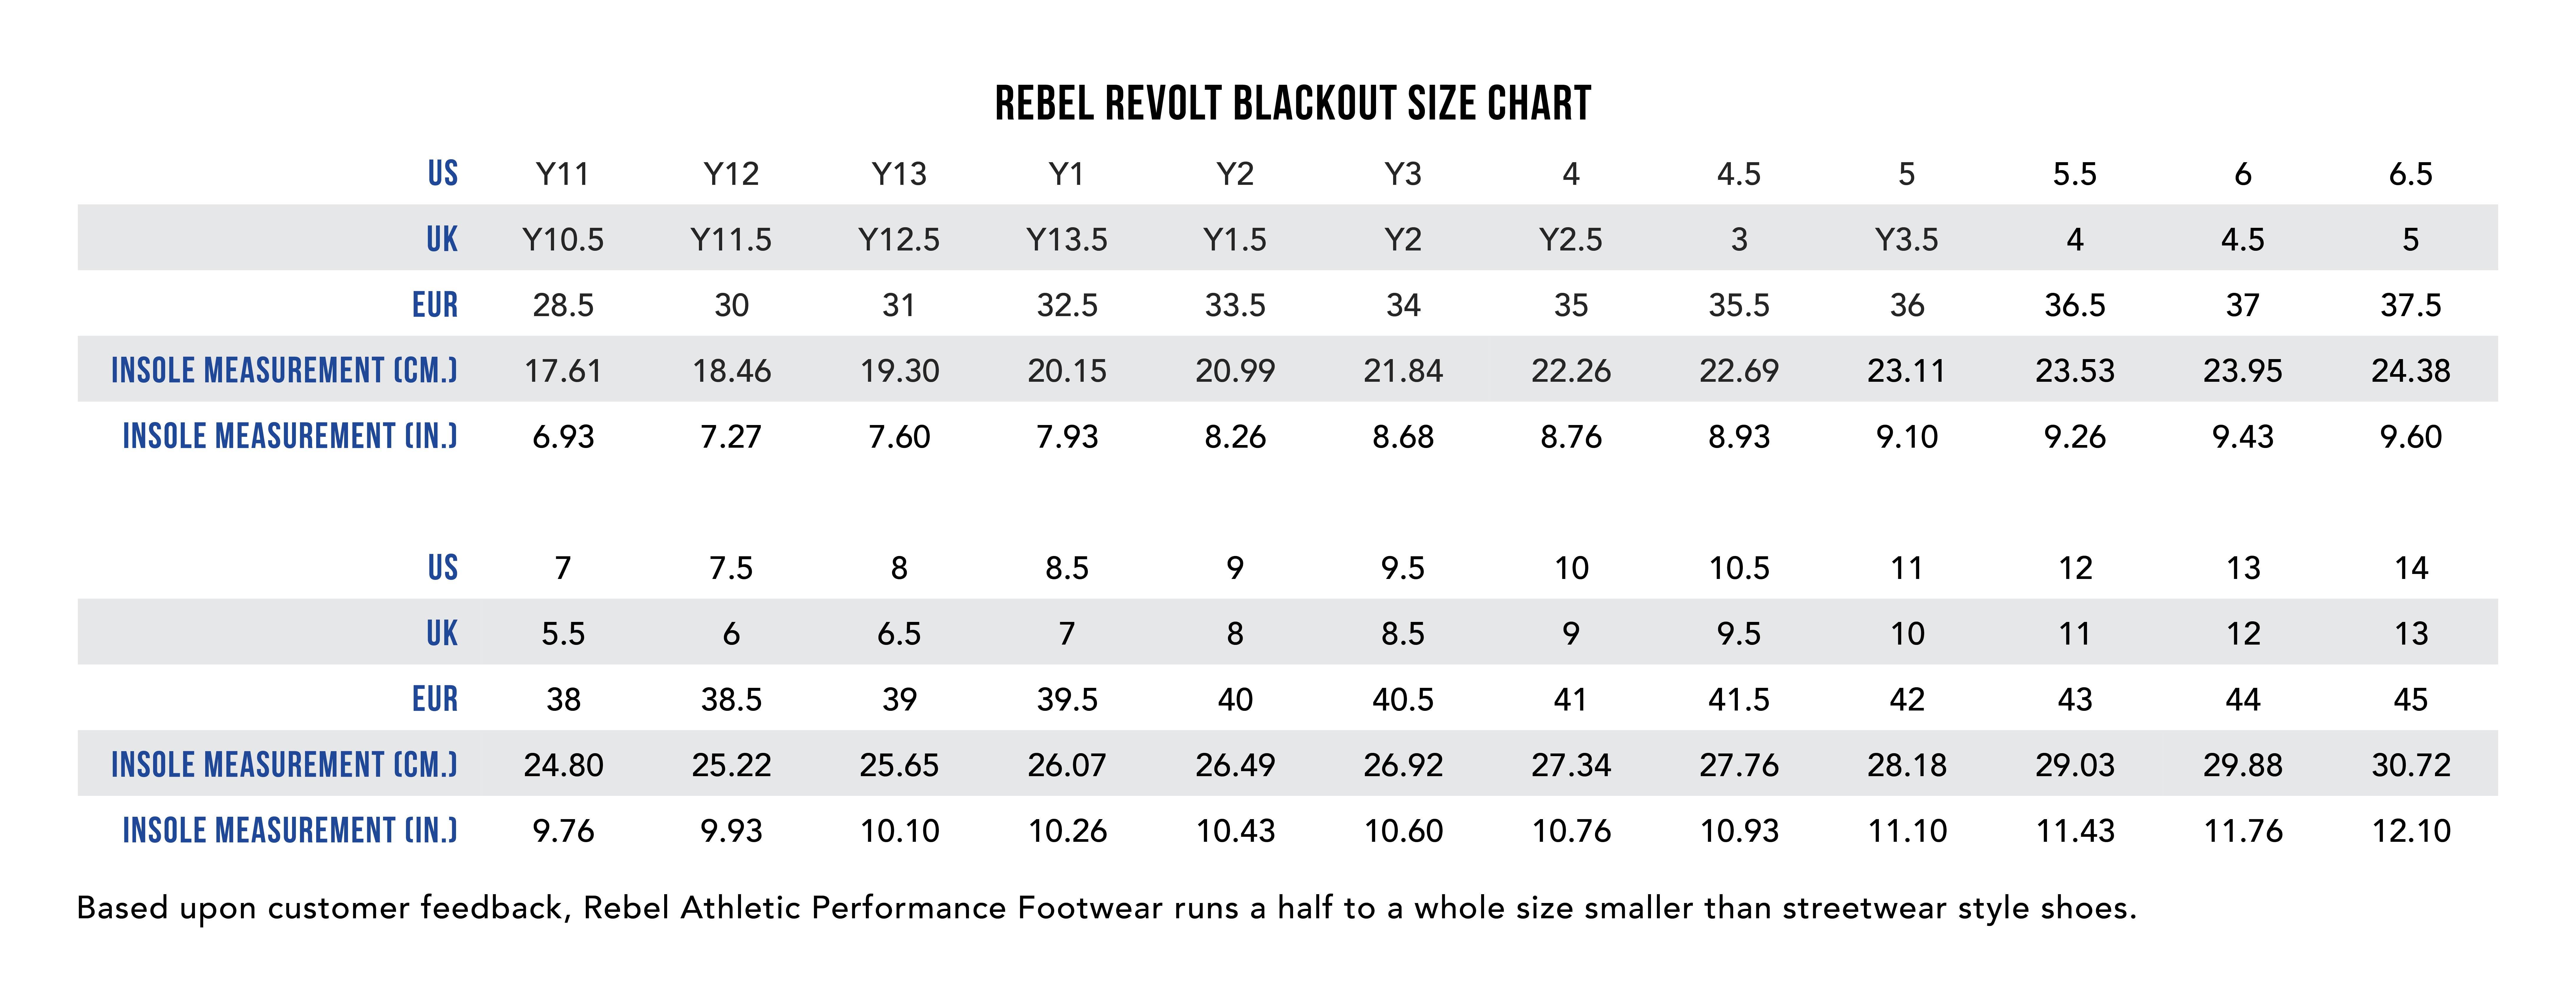 Size chart for rebel revolt blackout cheer shoes